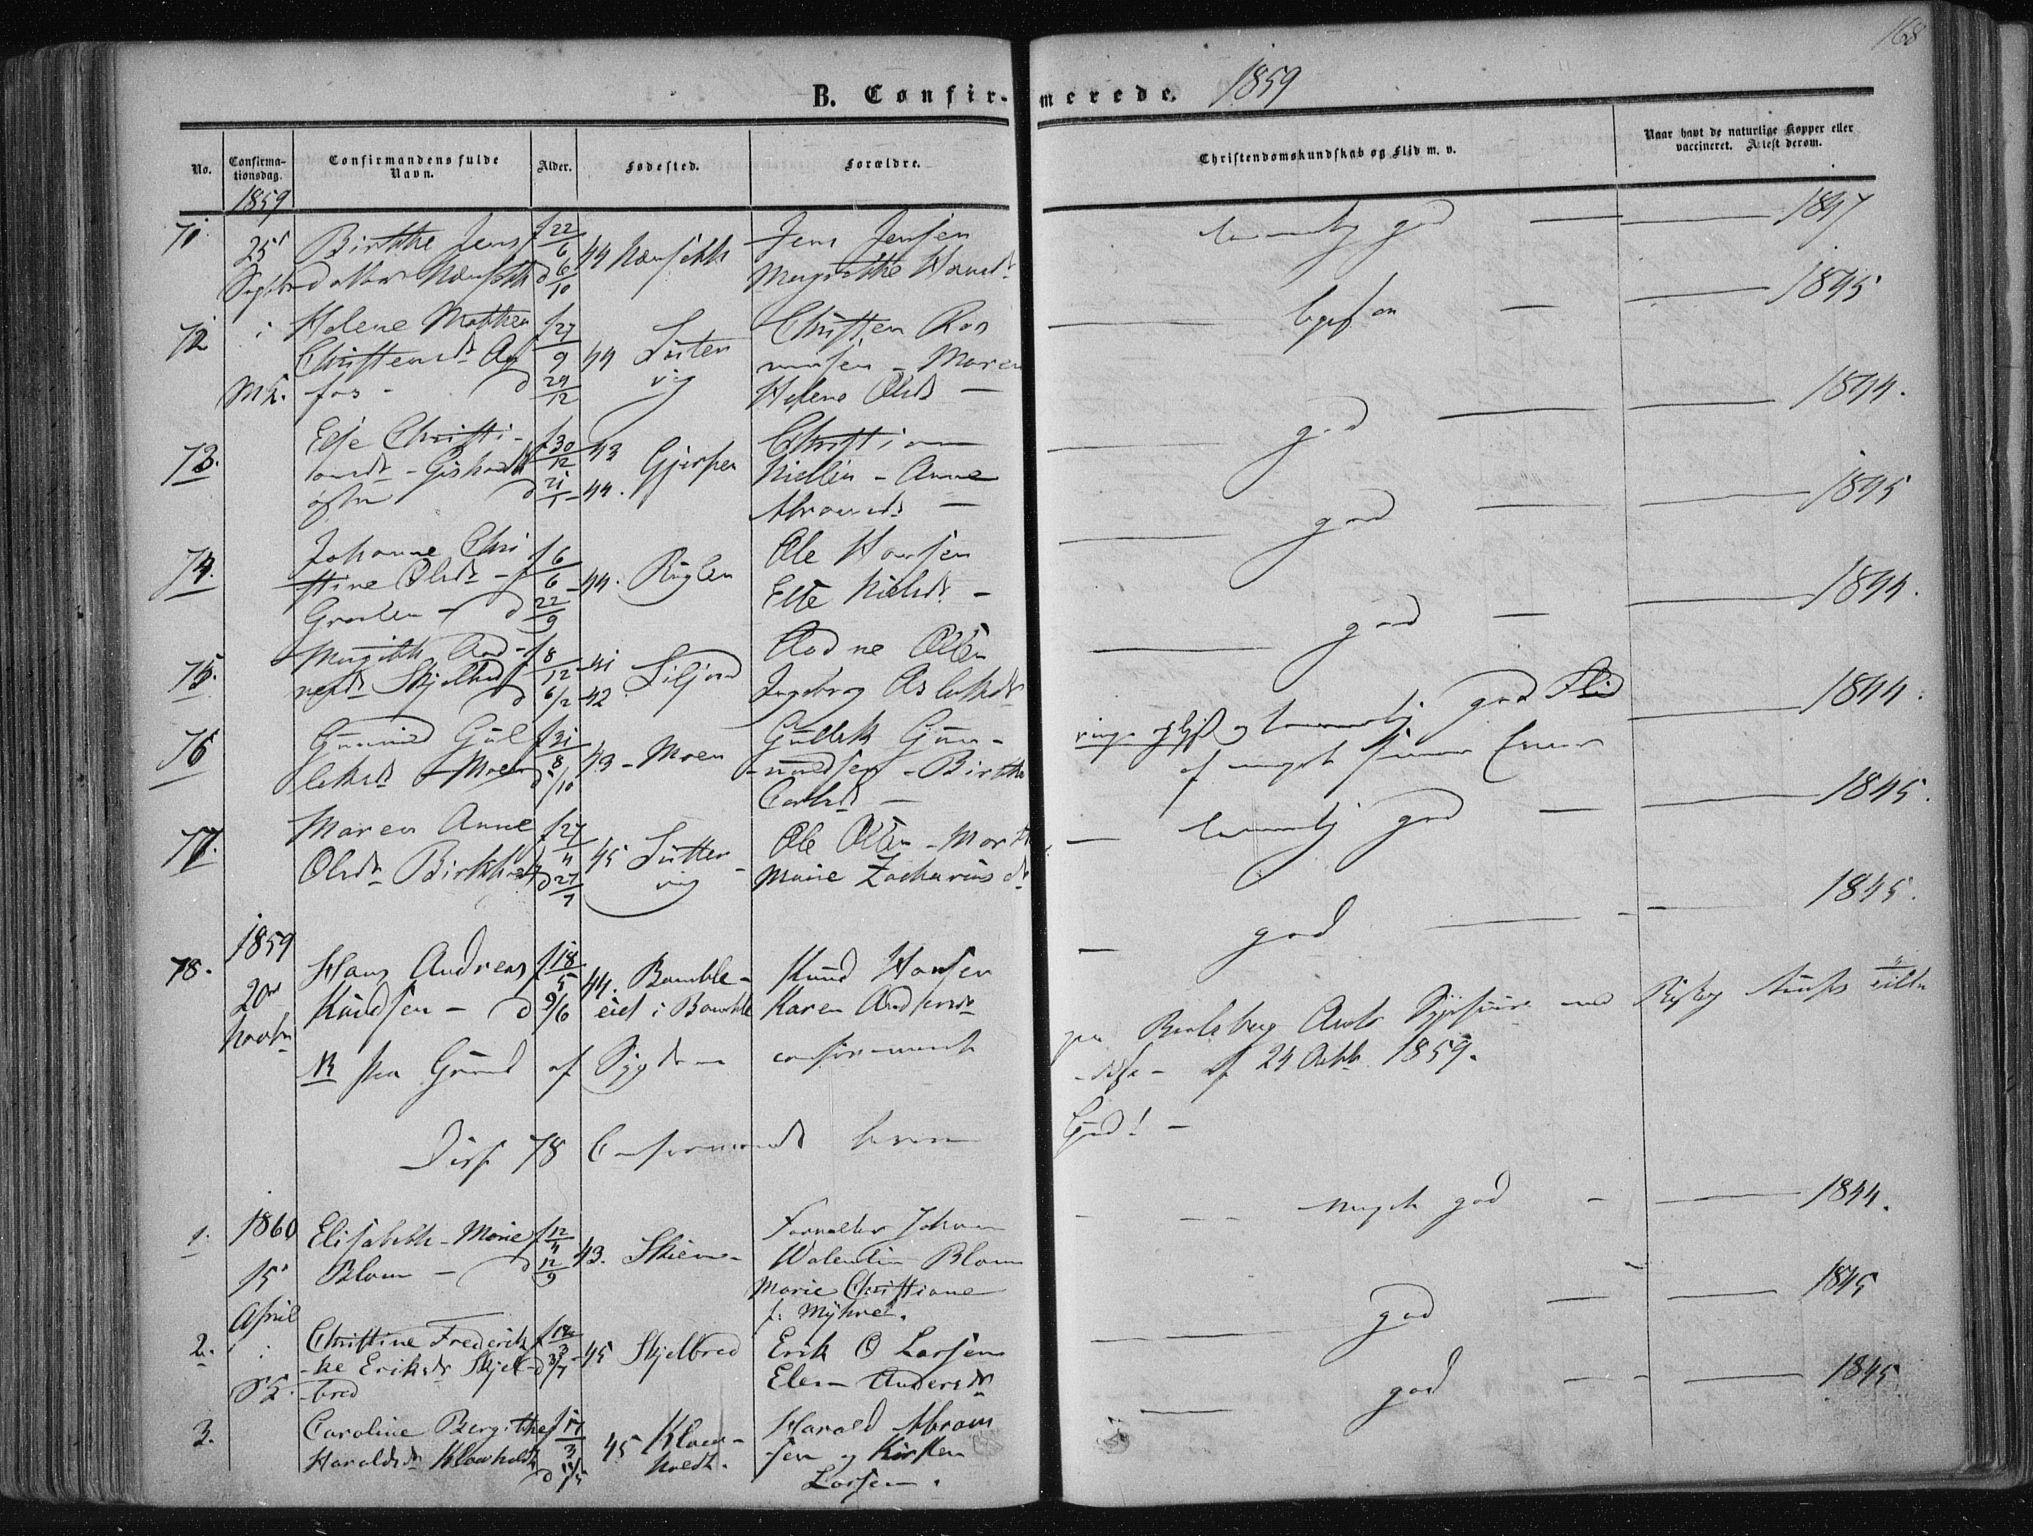 SAKO, Solum kirkebøker, F/Fa/L0007: Ministerialbok nr. I 7, 1856-1864, s. 168